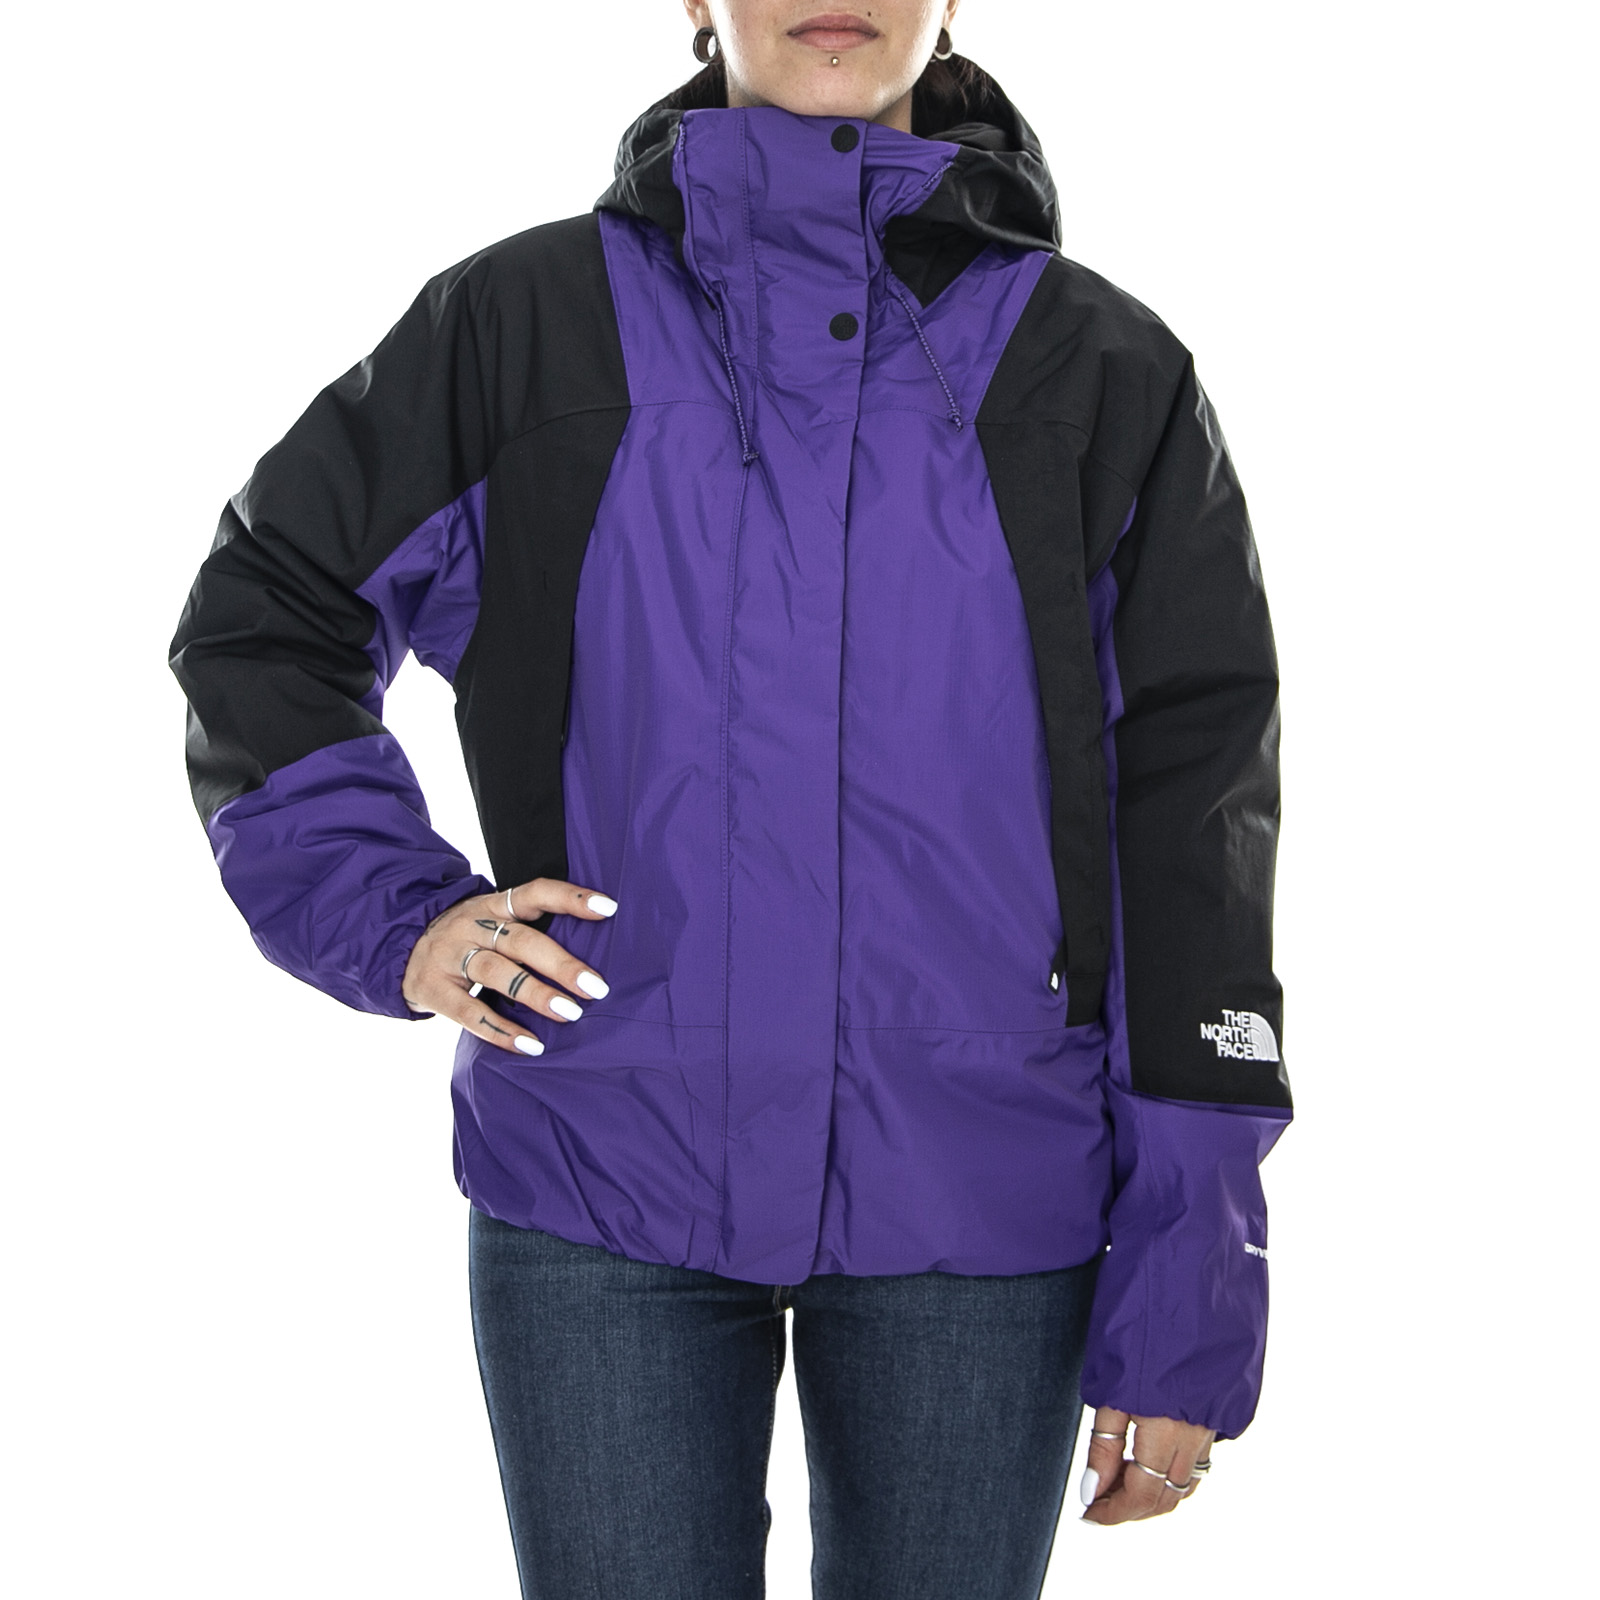 Dettagli su The North Face Wm Mountain Light Dreyvent VioletBlack Giacca Leggera Donna